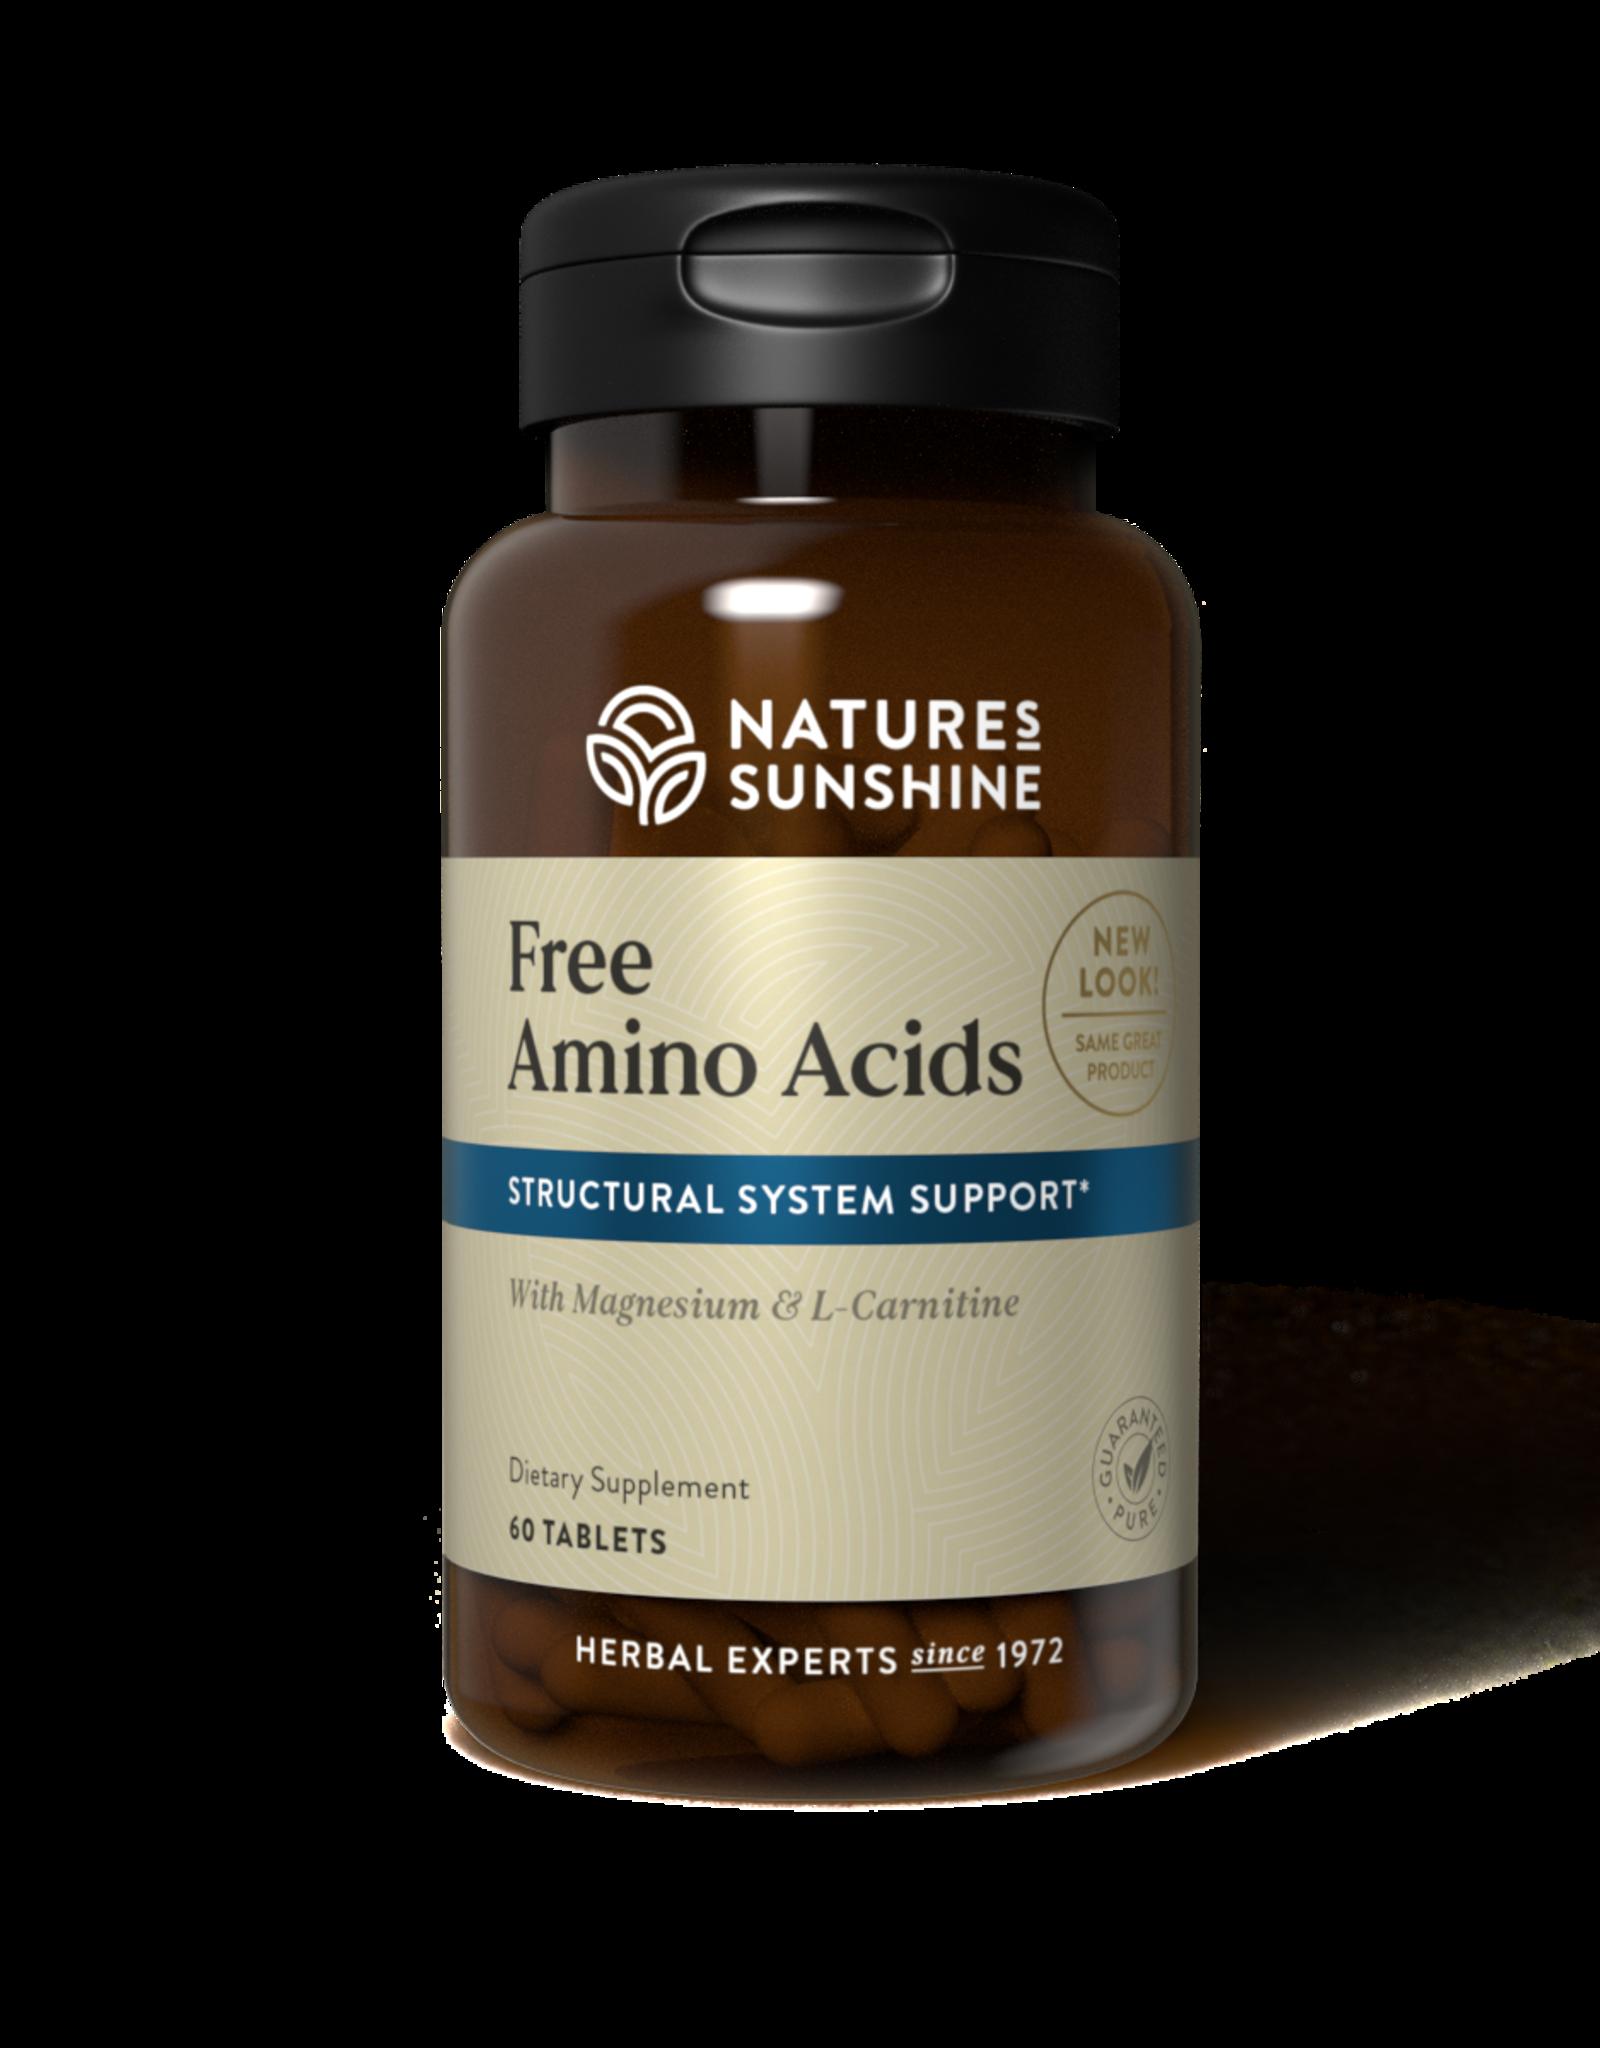 Nature's Sunshine Free Amino Acids (60 tabs)